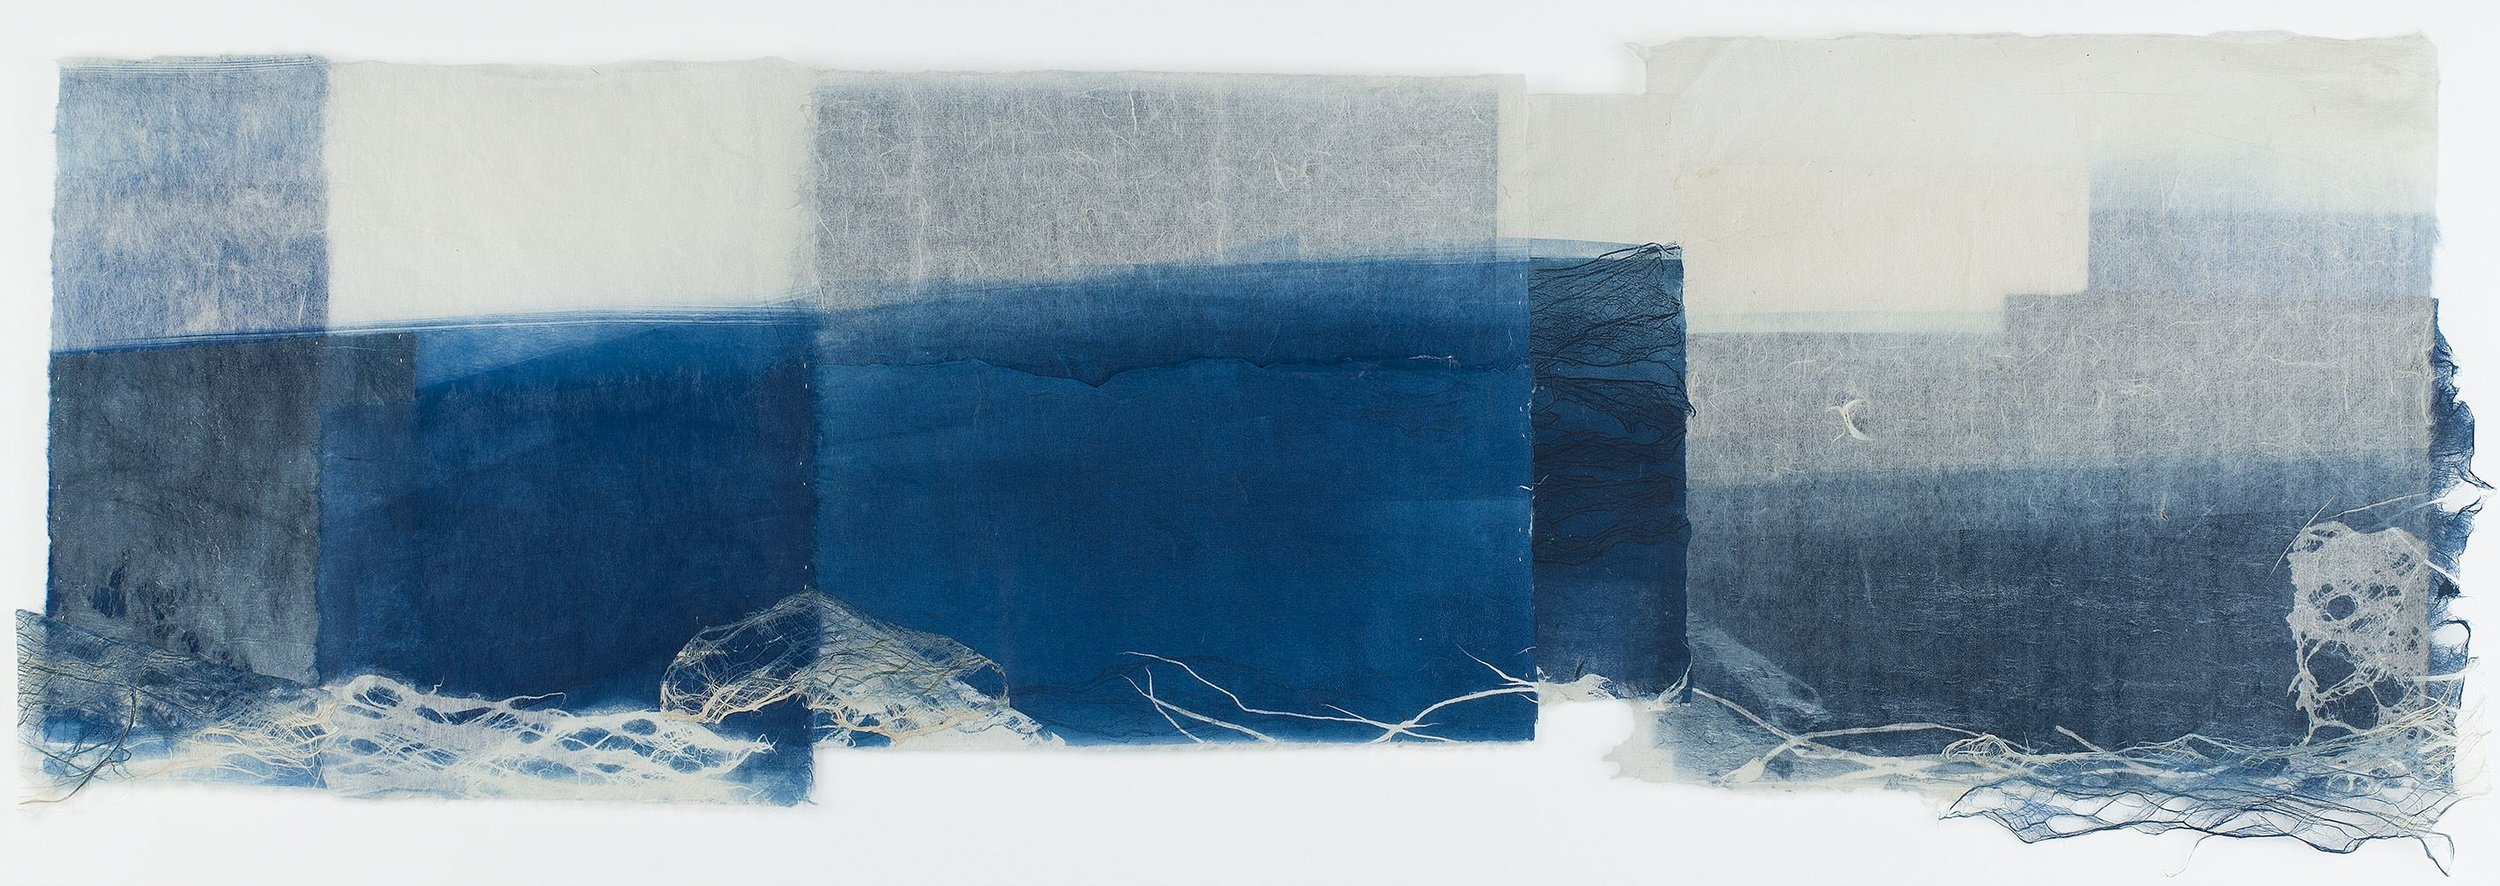 Yuko Kimura    Little Wave III  , 2016 Monotype on kozo (mulberry) handmade paper, kozo bark fiber, thread, collage 13 x 40 inches 33 x 101.6 cm YuK 38